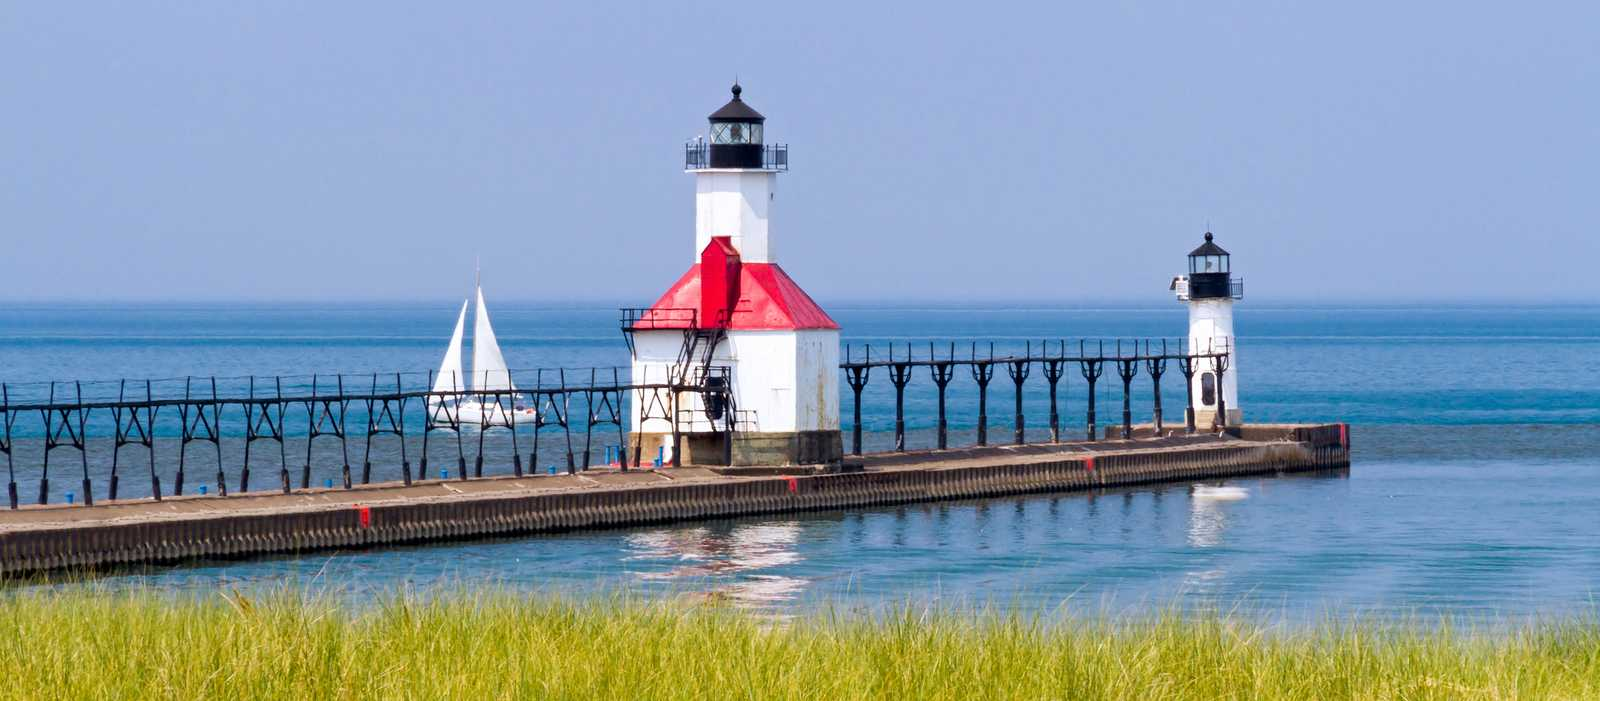 Leuchttürme am St. Joseph North Pier, Michigan